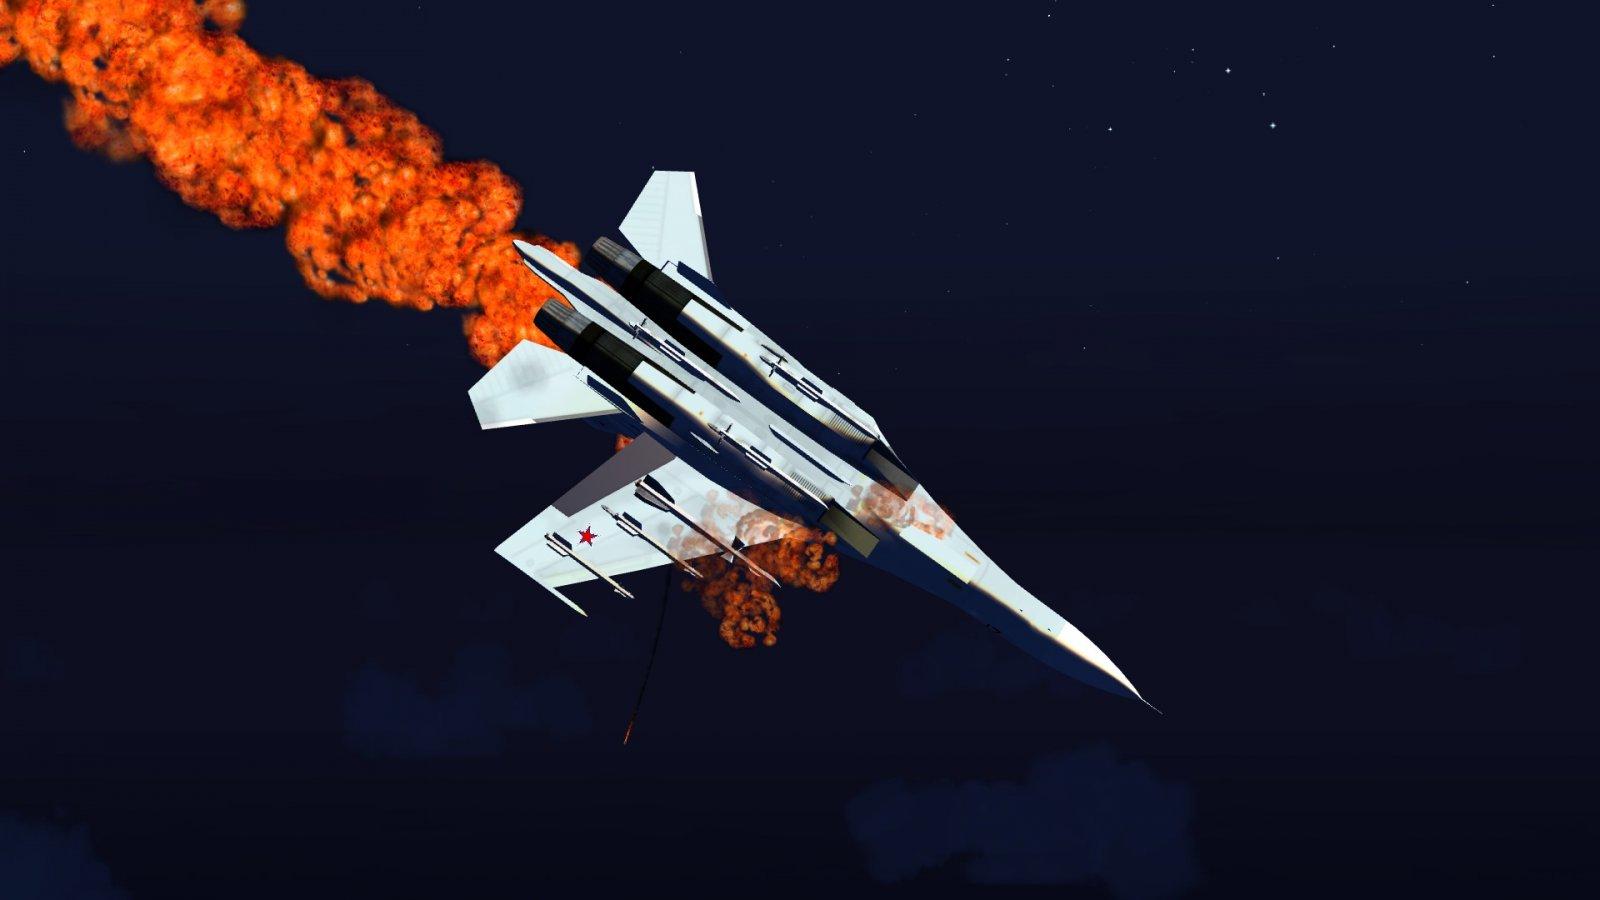 Splat One Su-30